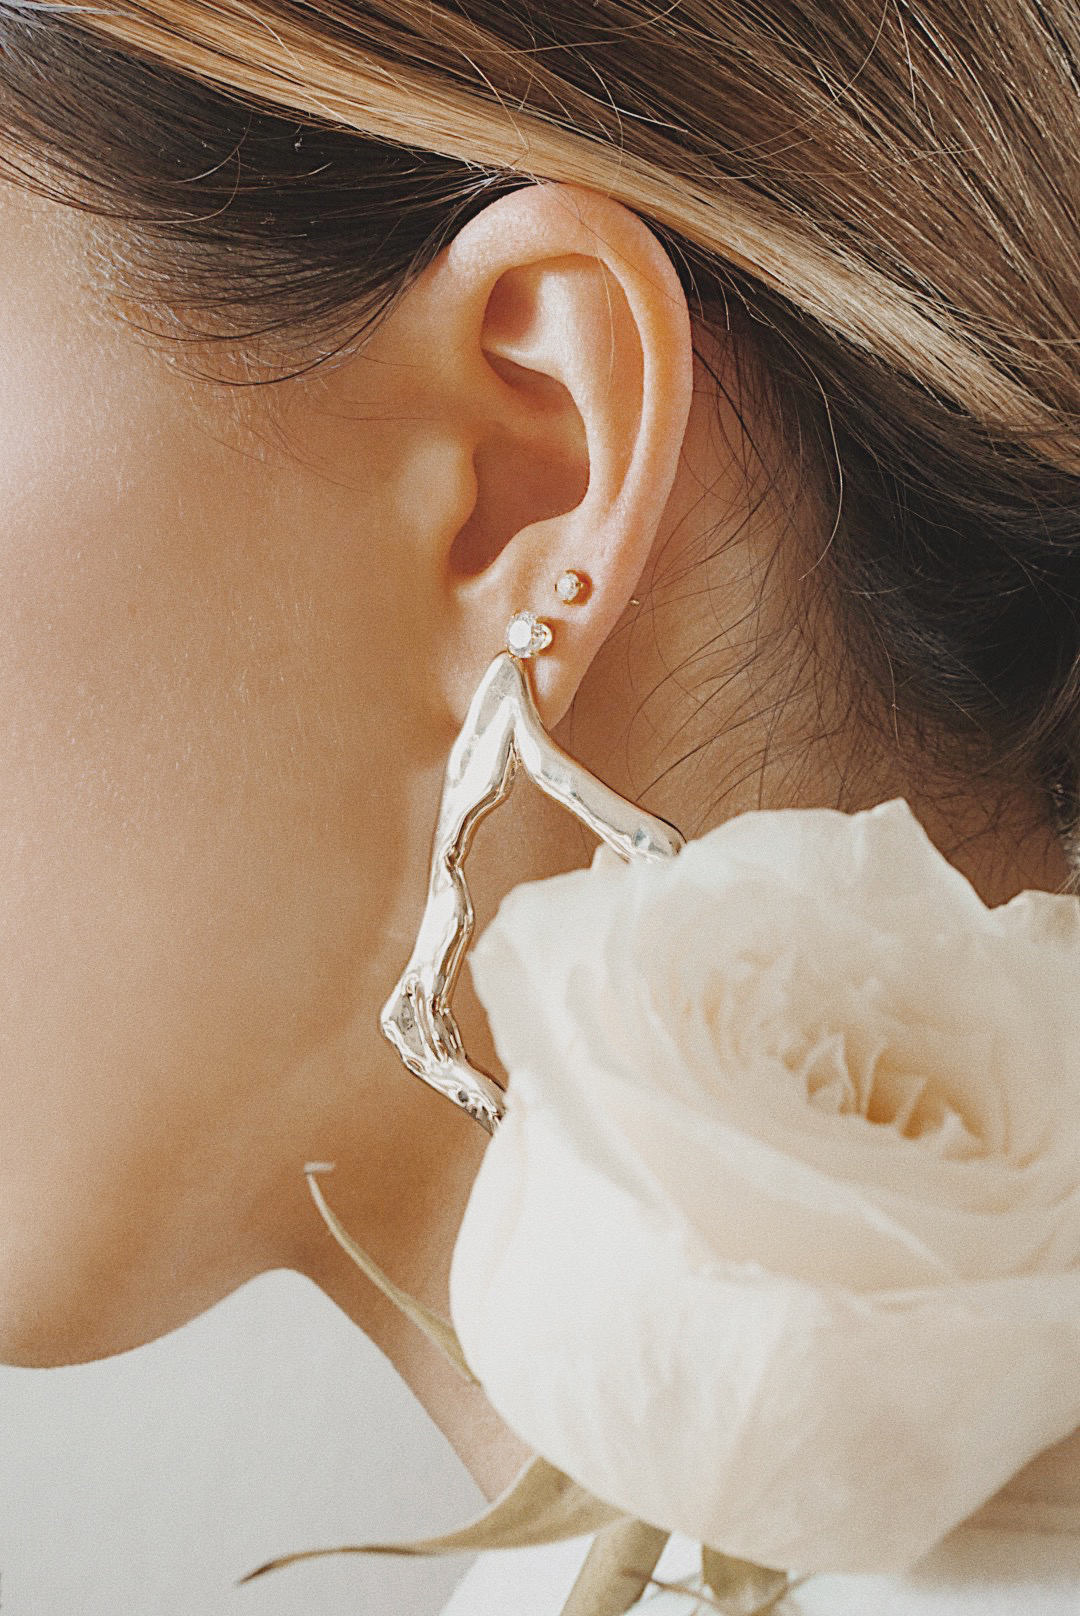 ana_luisa_earrings_roses_photoshoor_jewelry_jewels_the_white_ocean_lena_juice_05